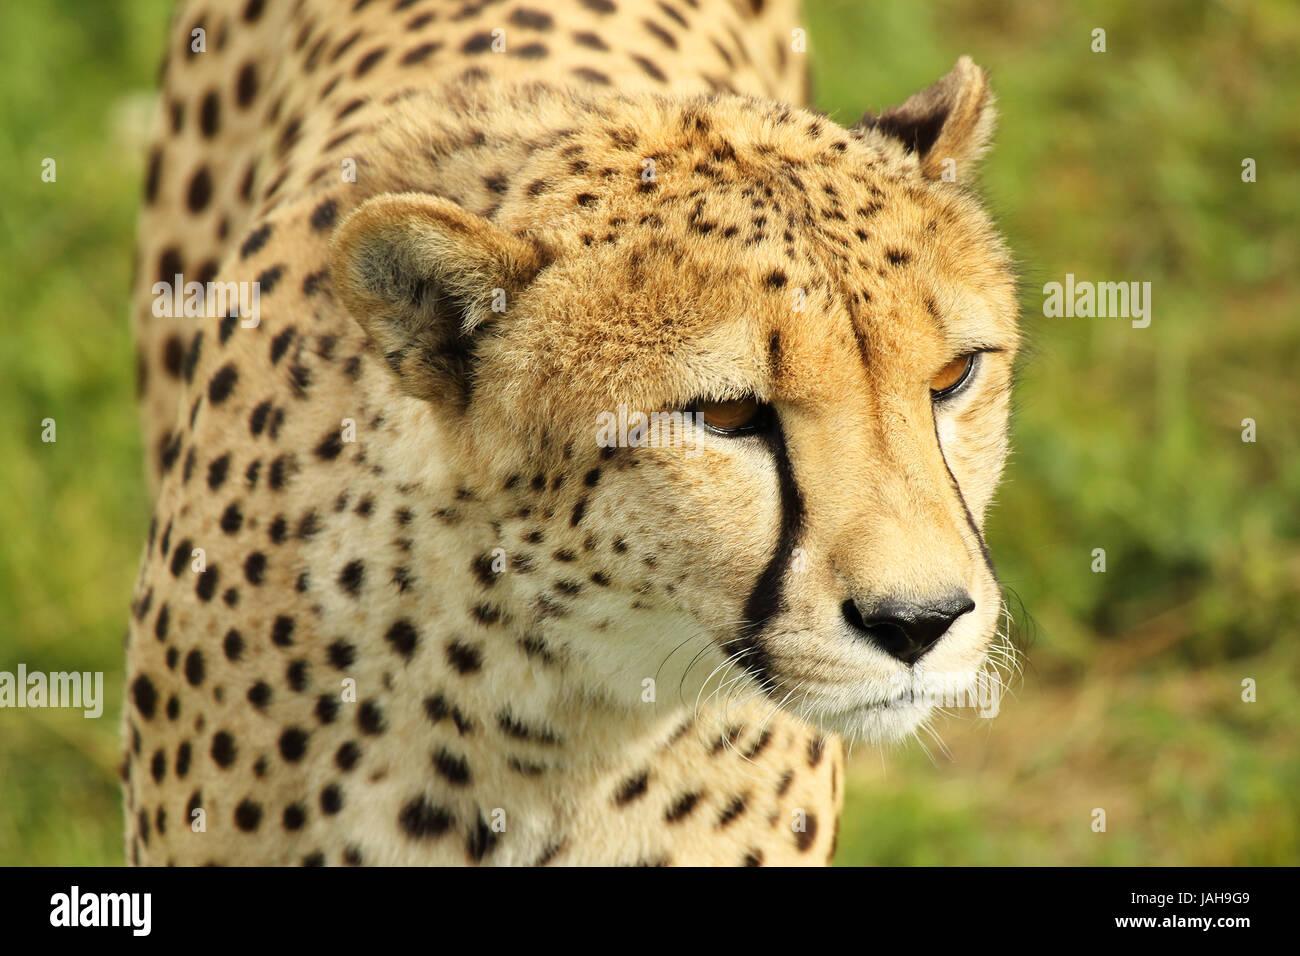 A portrait of a Cheetah giving a pugilistic gaze. - Stock Image